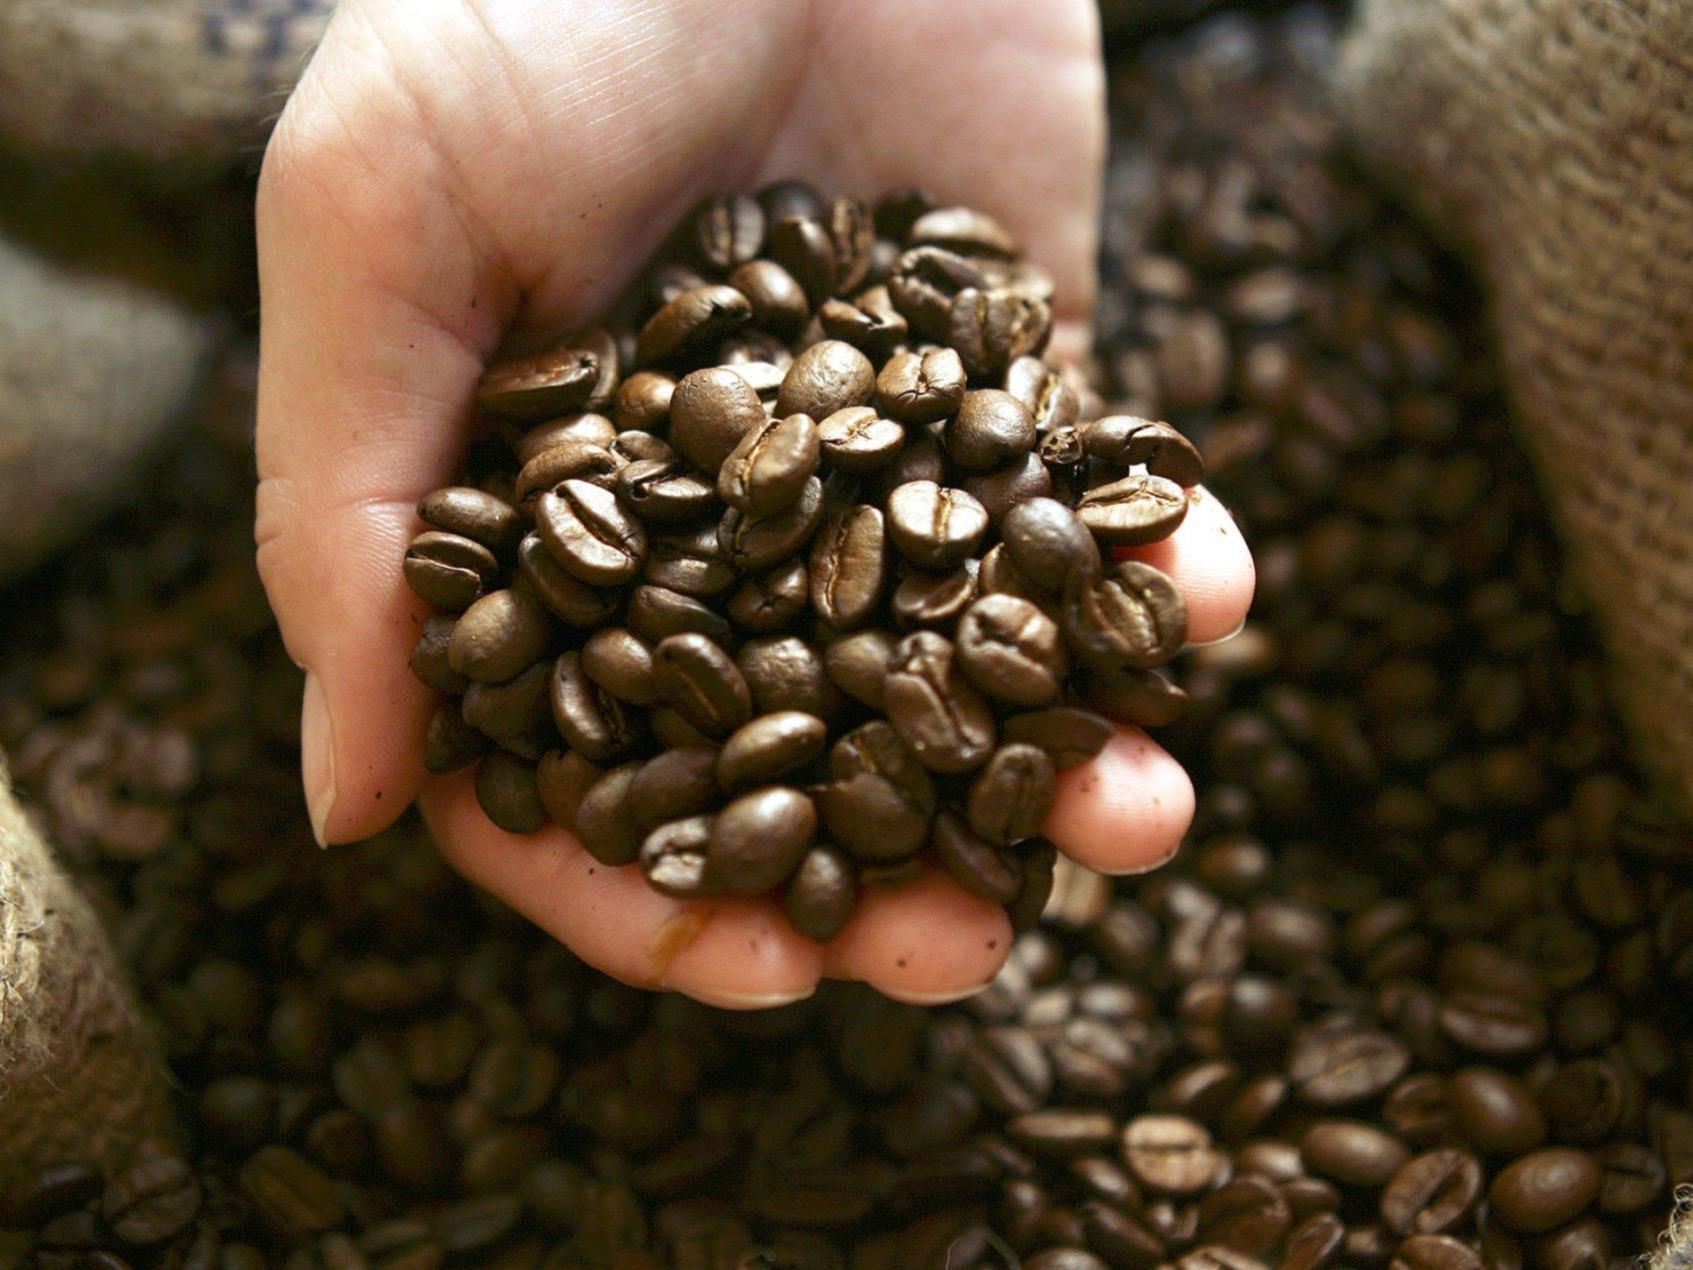 Meinl Kaffee nimmt England ins Visier - Weltmarke 2025 als Ziel